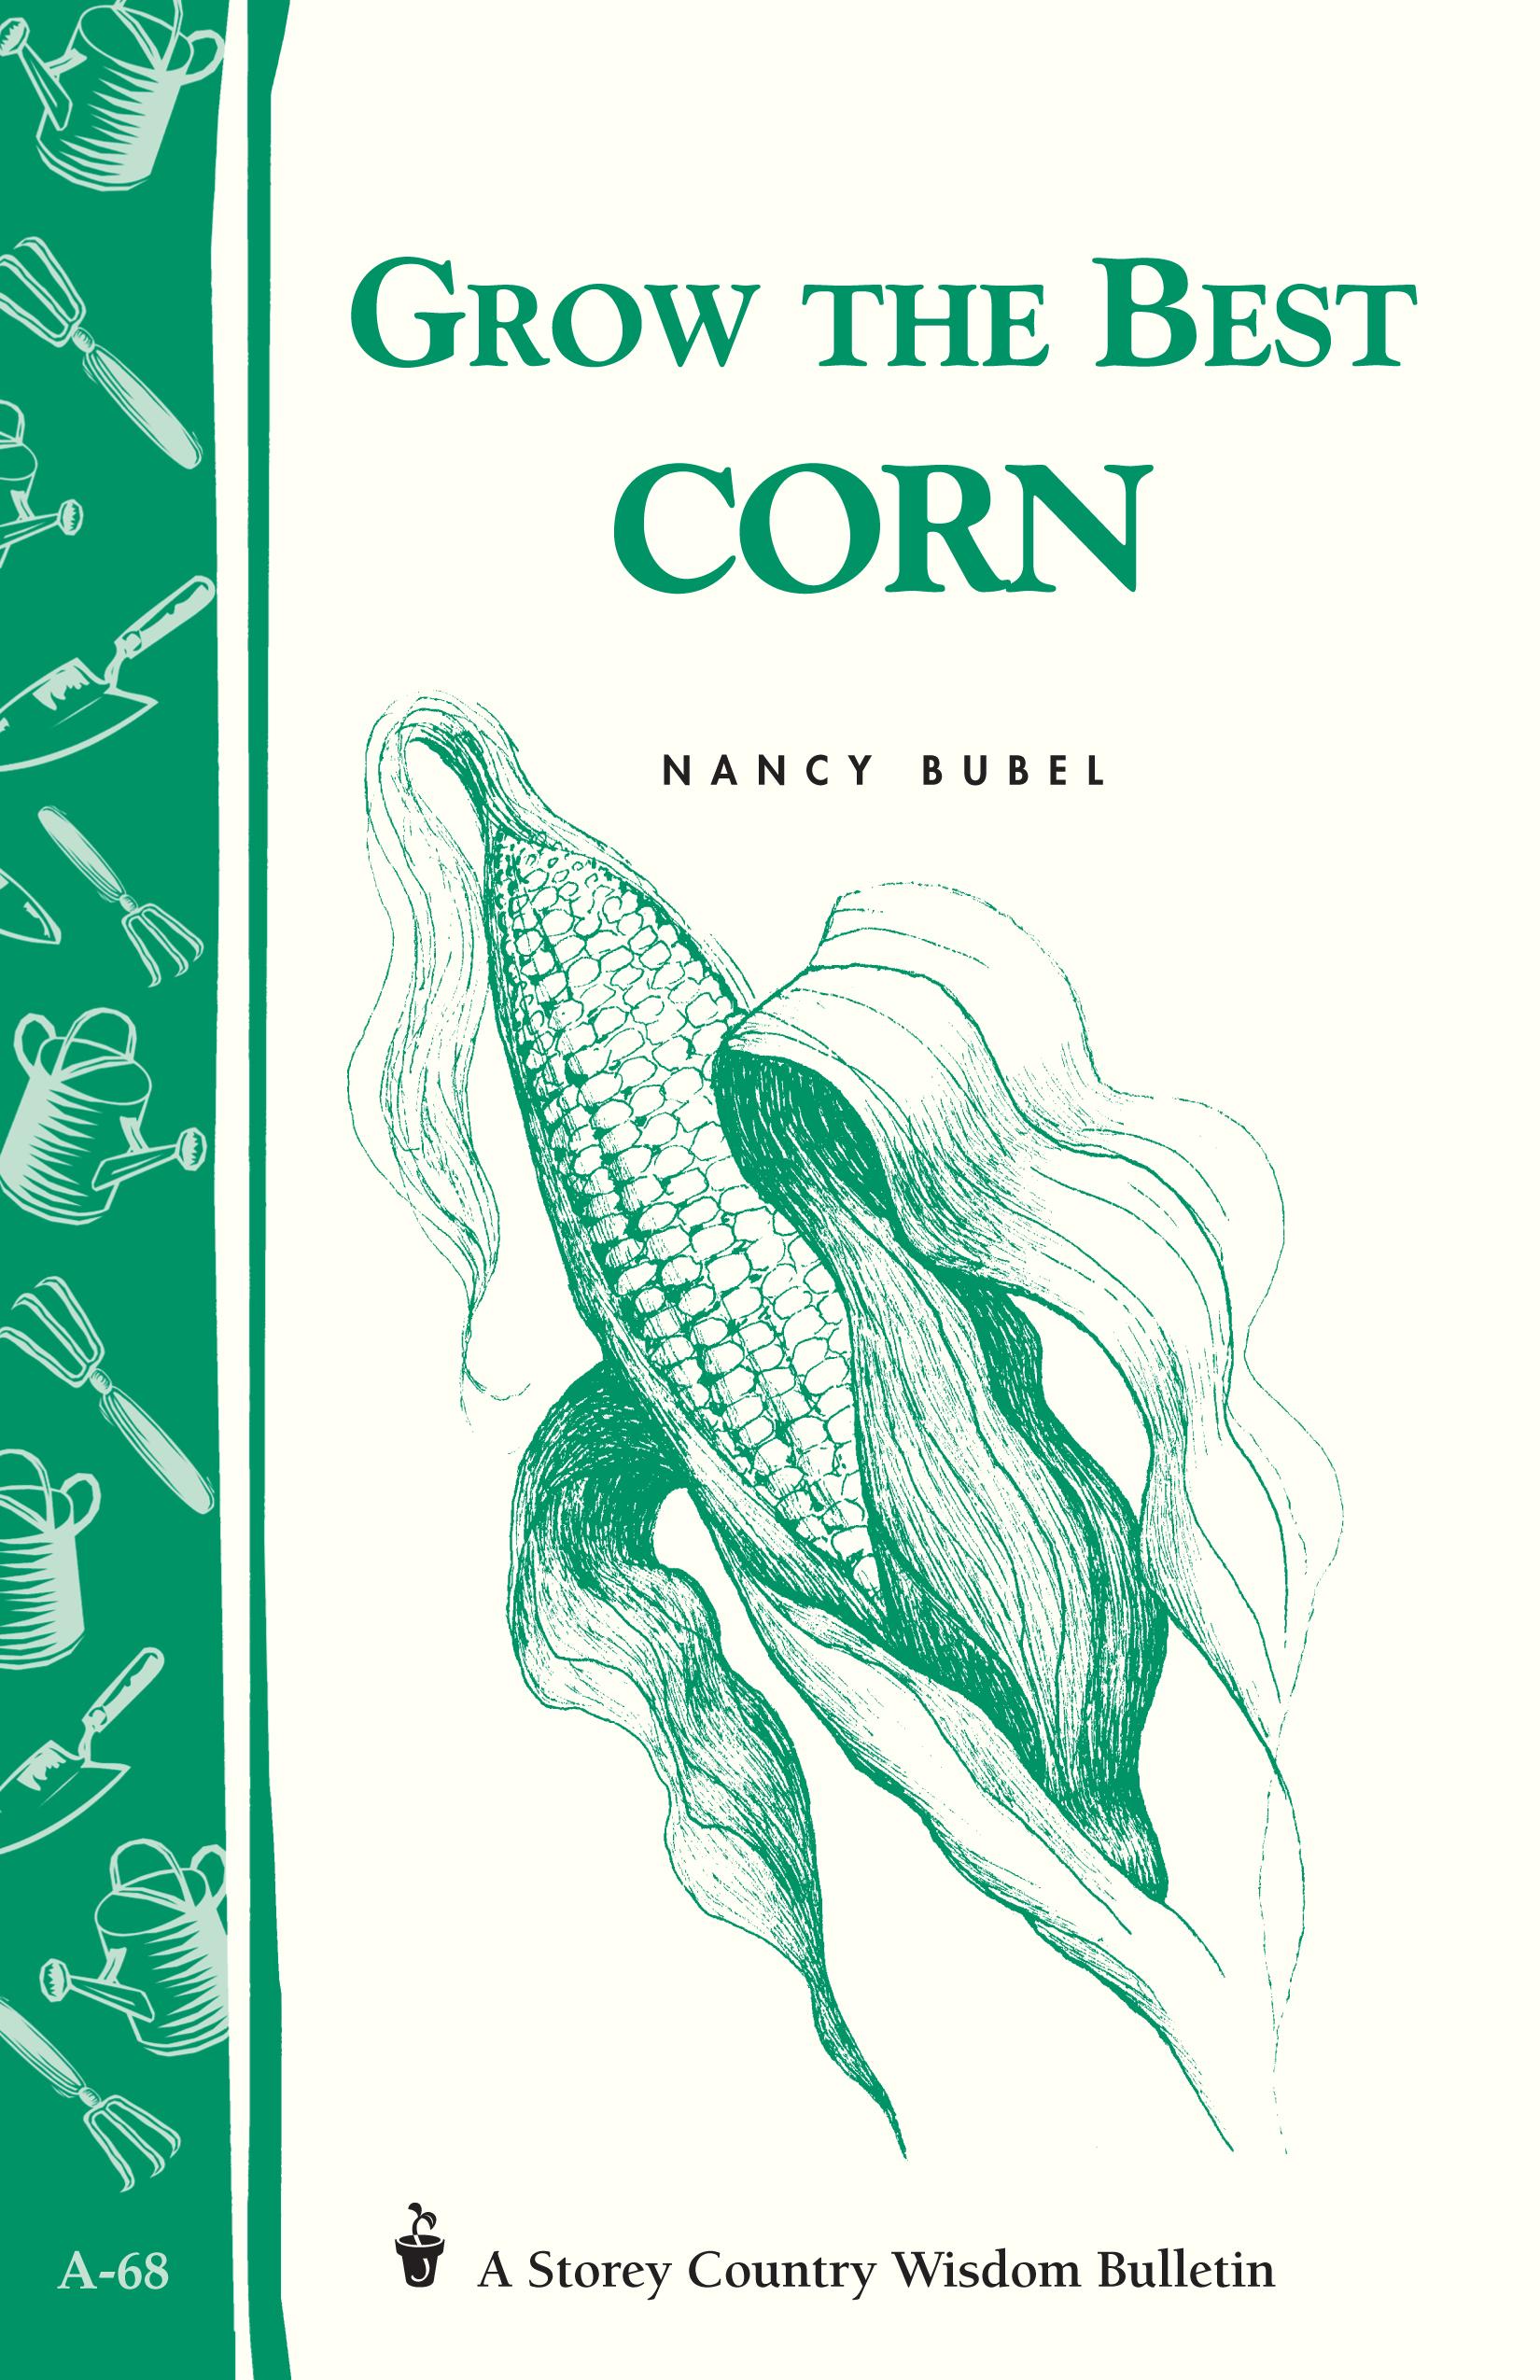 Grow the Best Corn Storey's Country Wisdom Bulletin A-68 - Nancy Bubel